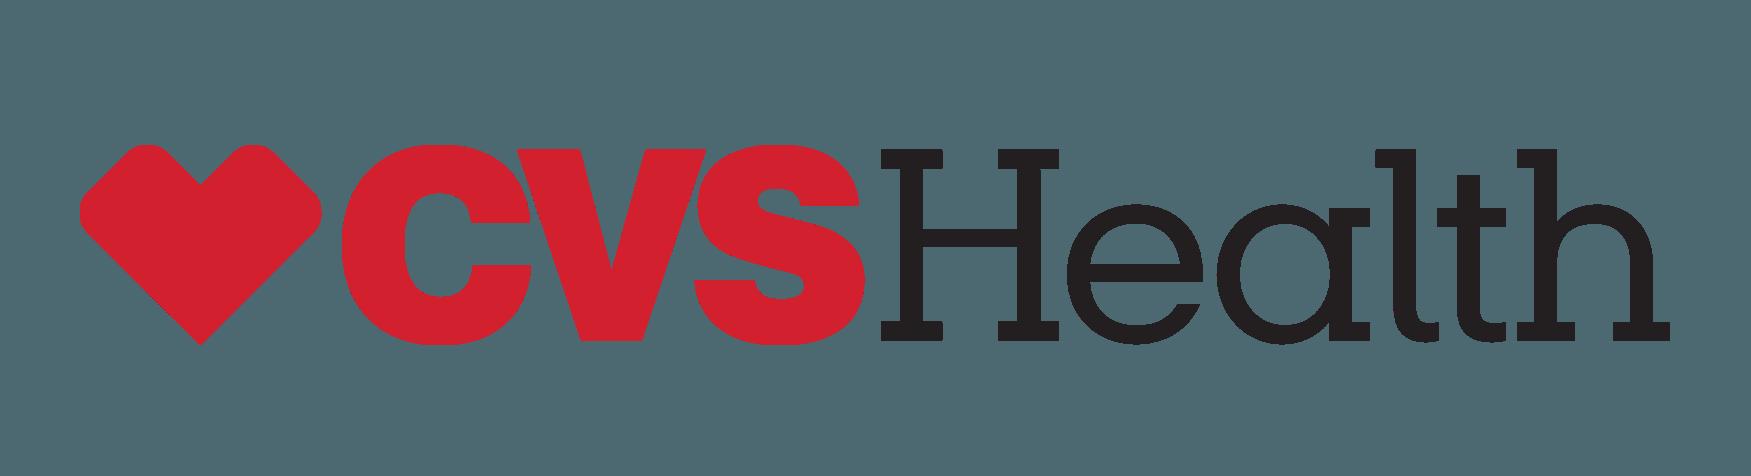 CVS Health and DeJesus Driveways